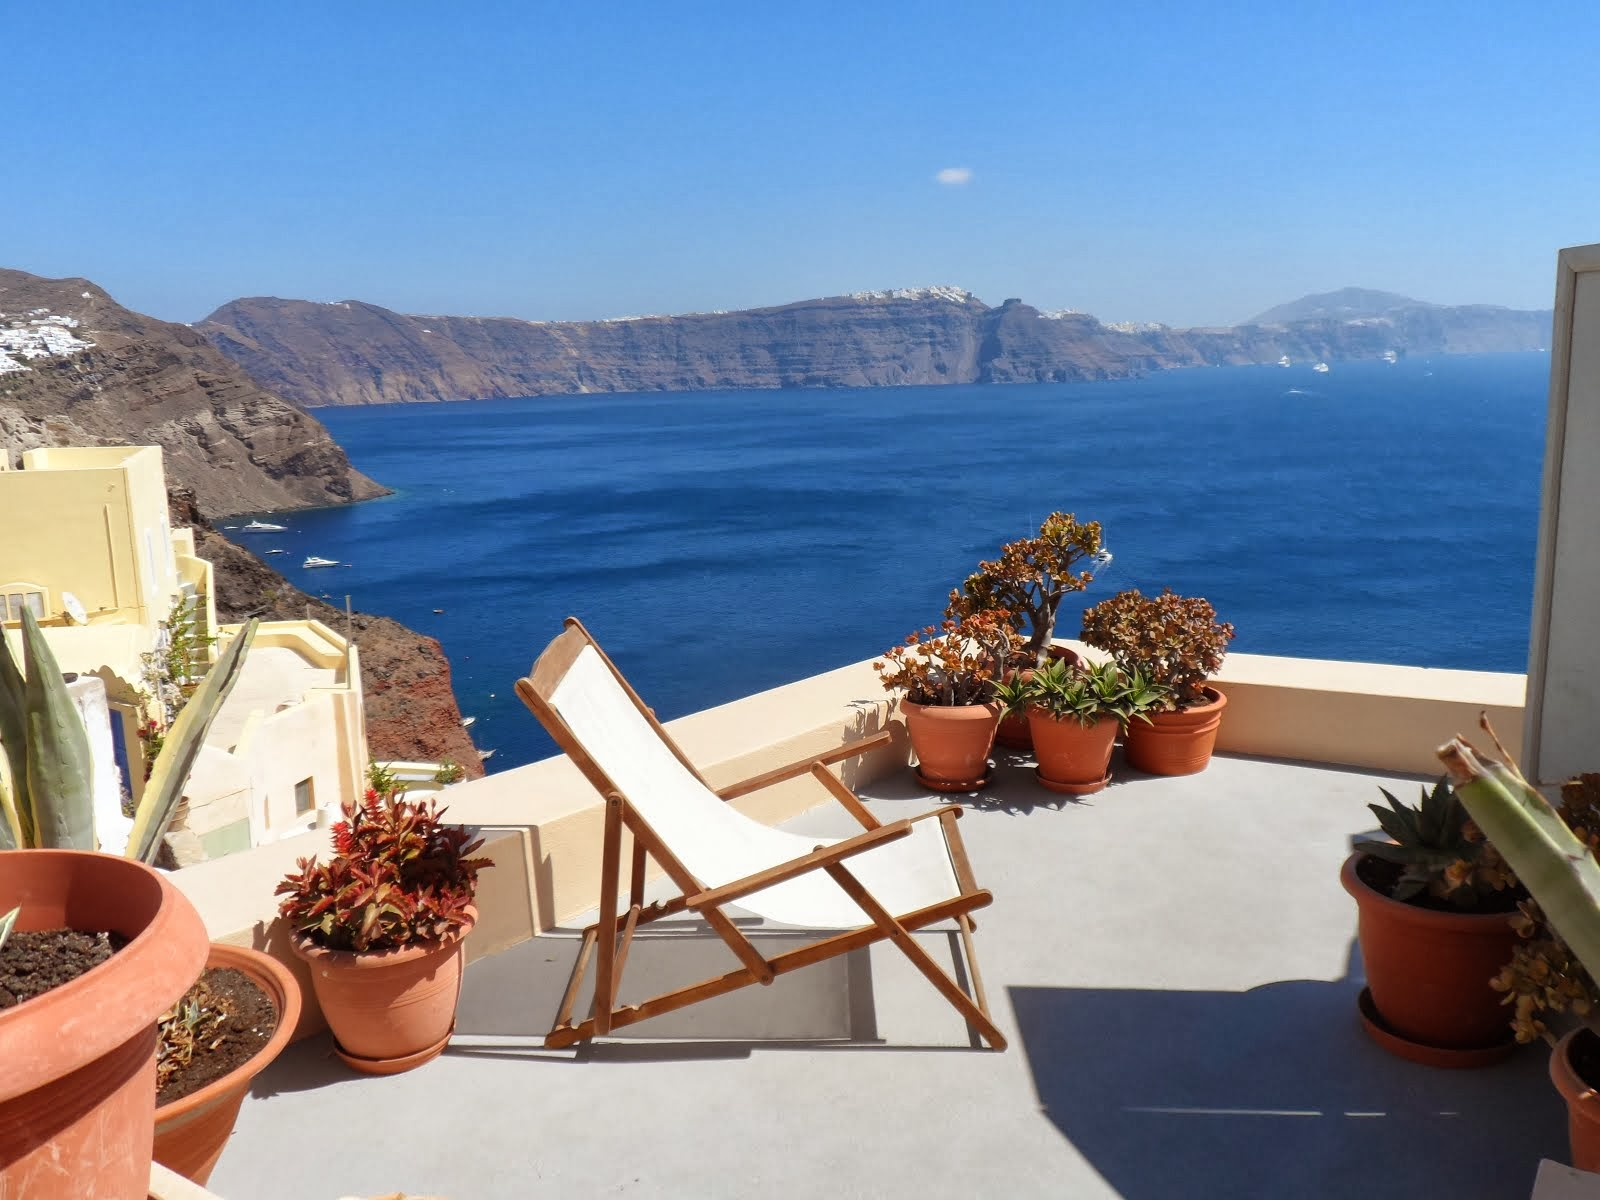 Oia - Santorini (Grecia)